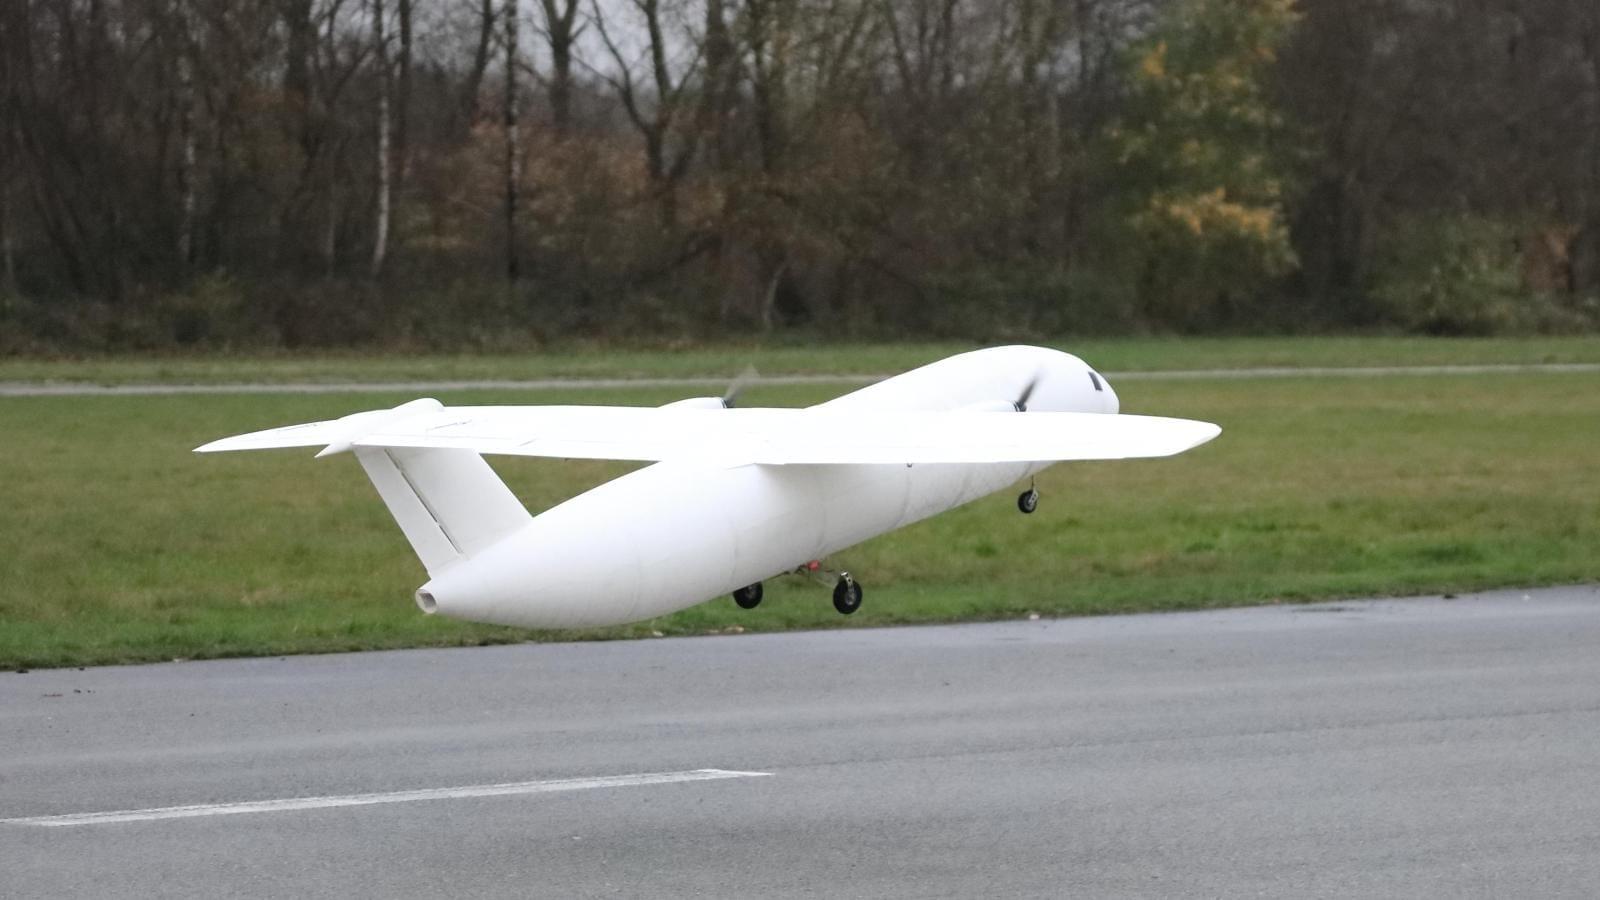 To-prwto-aeroplano-3d